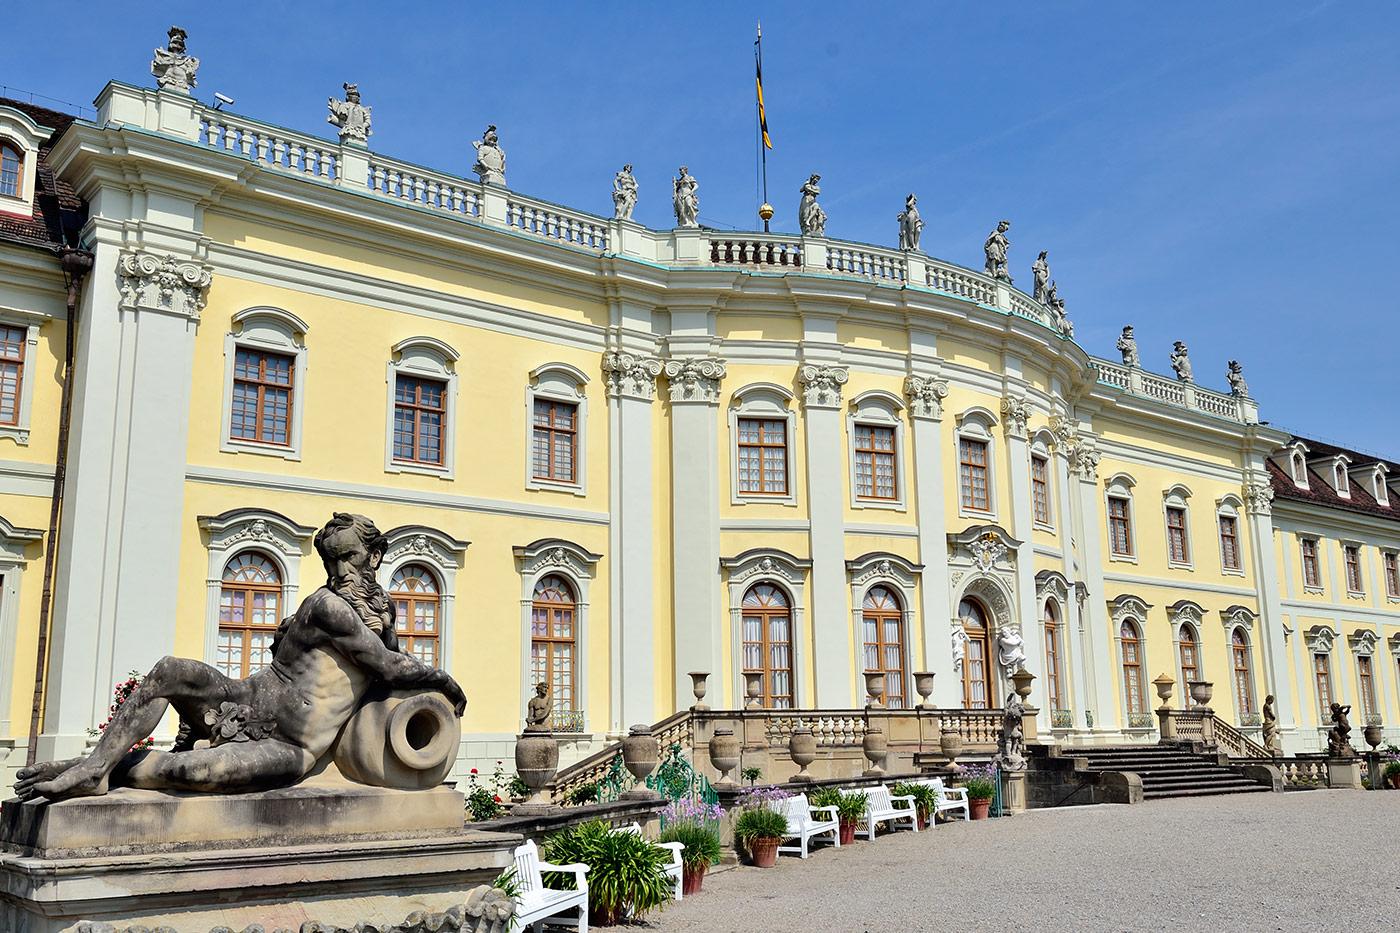 Ludwigsburg Residenz